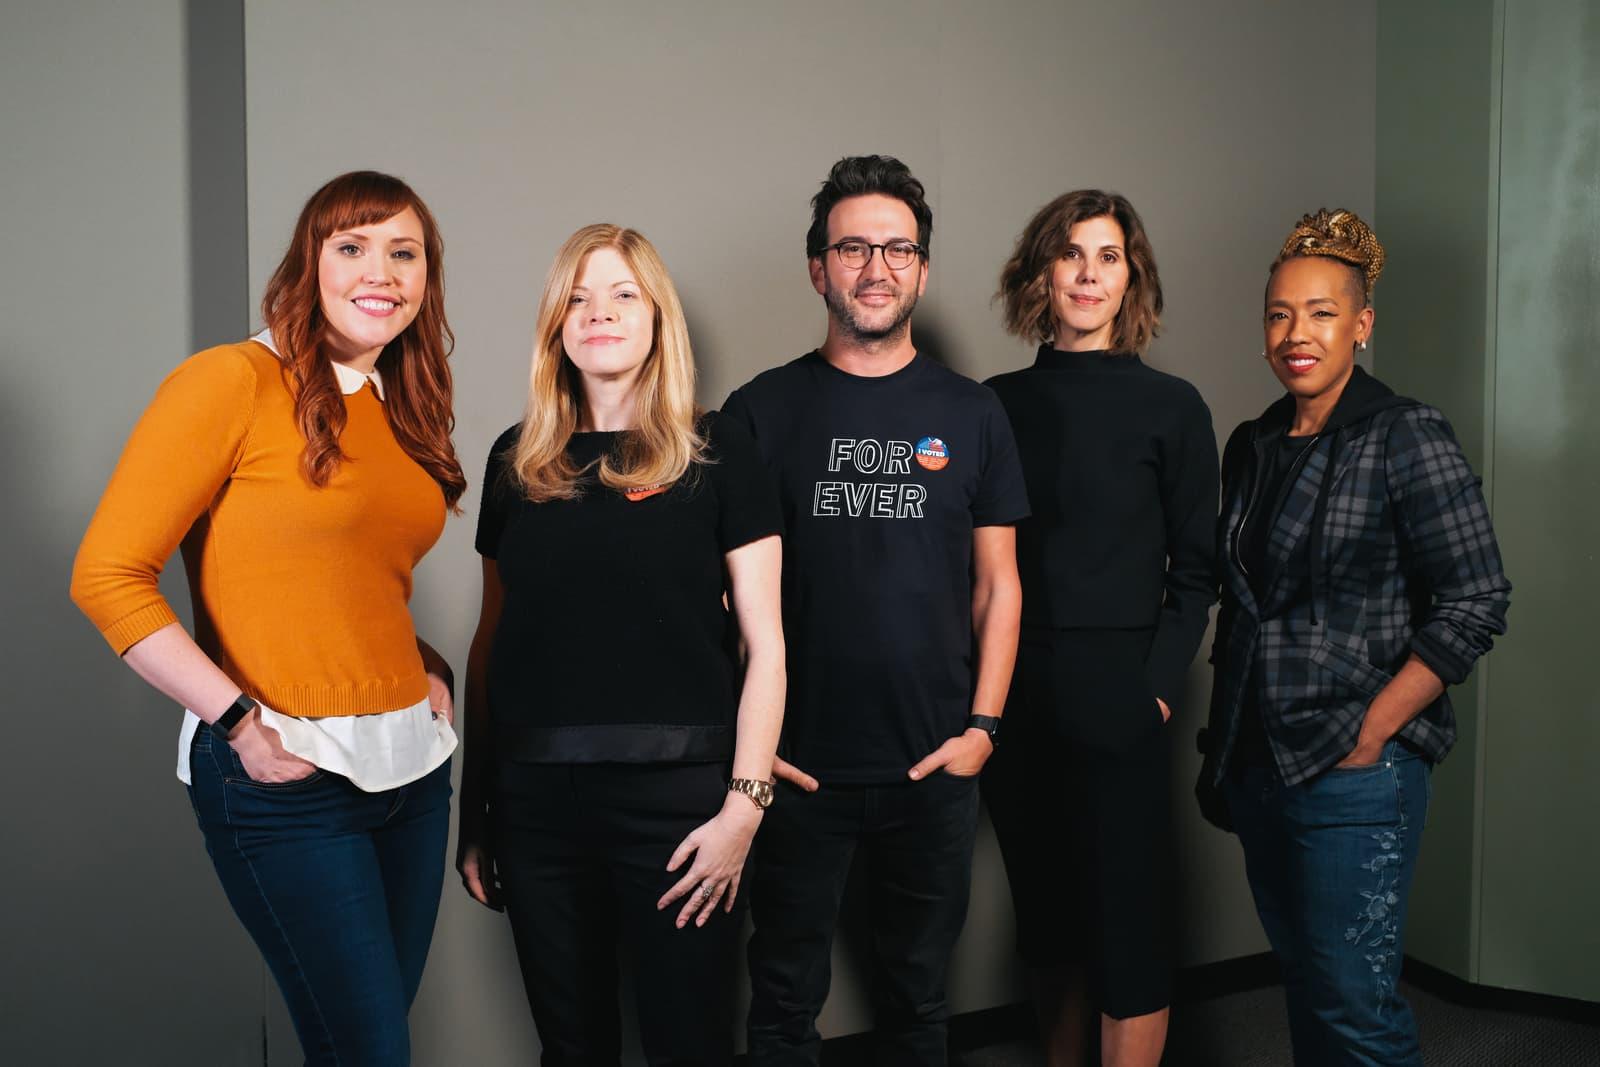 The Marvel After Show - Josh Schwartz, Stephanie Savage, and Alex Patsavas